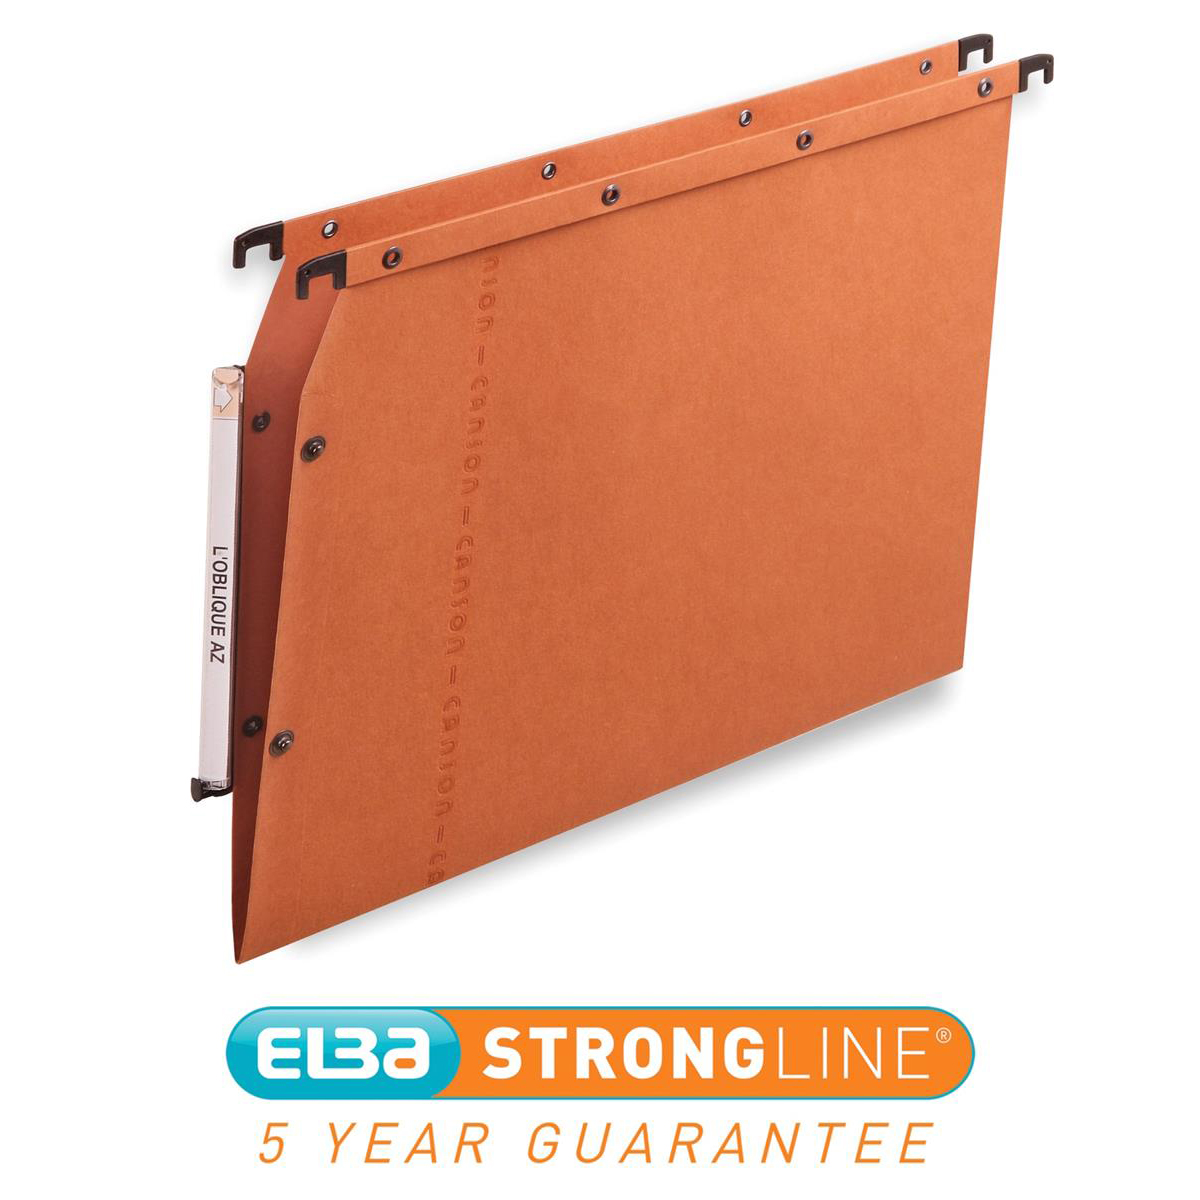 Elba Ultimate AZV Linking Lateral File Manilla 15mm V-base 240gsm A4 Orange Ref 100330473 Pack 25